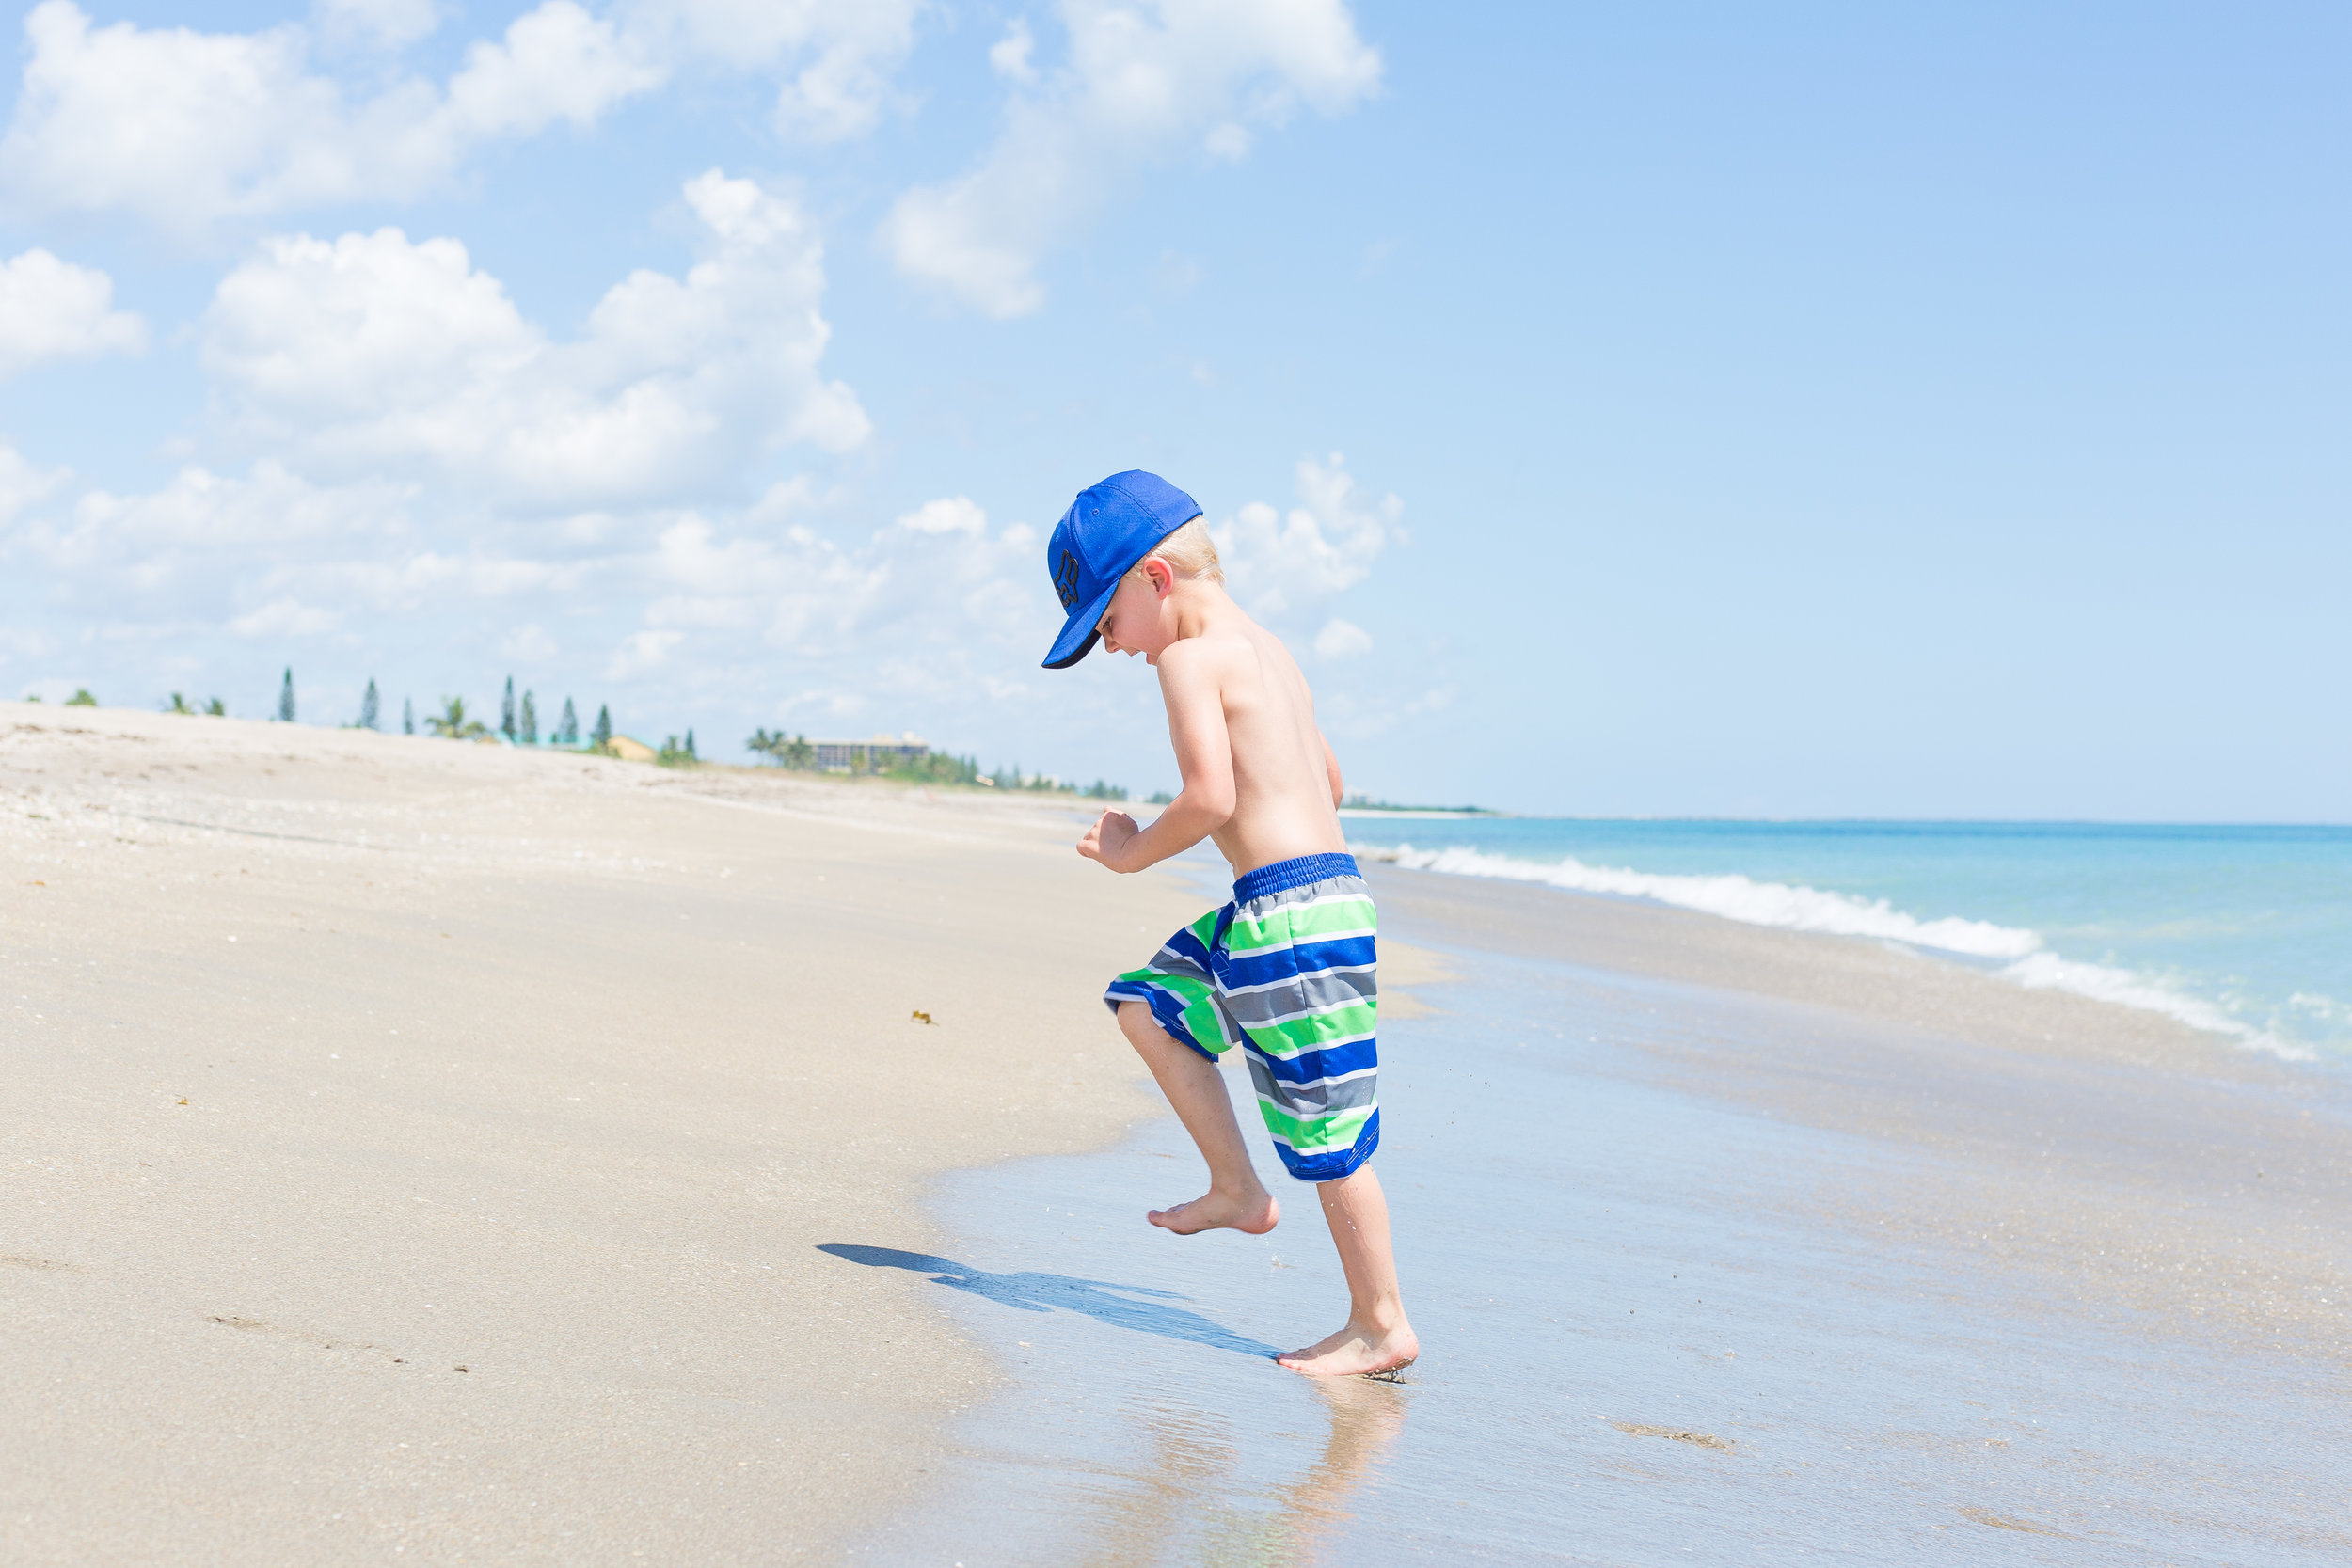 Florida Beach Personal Project-14.jpg